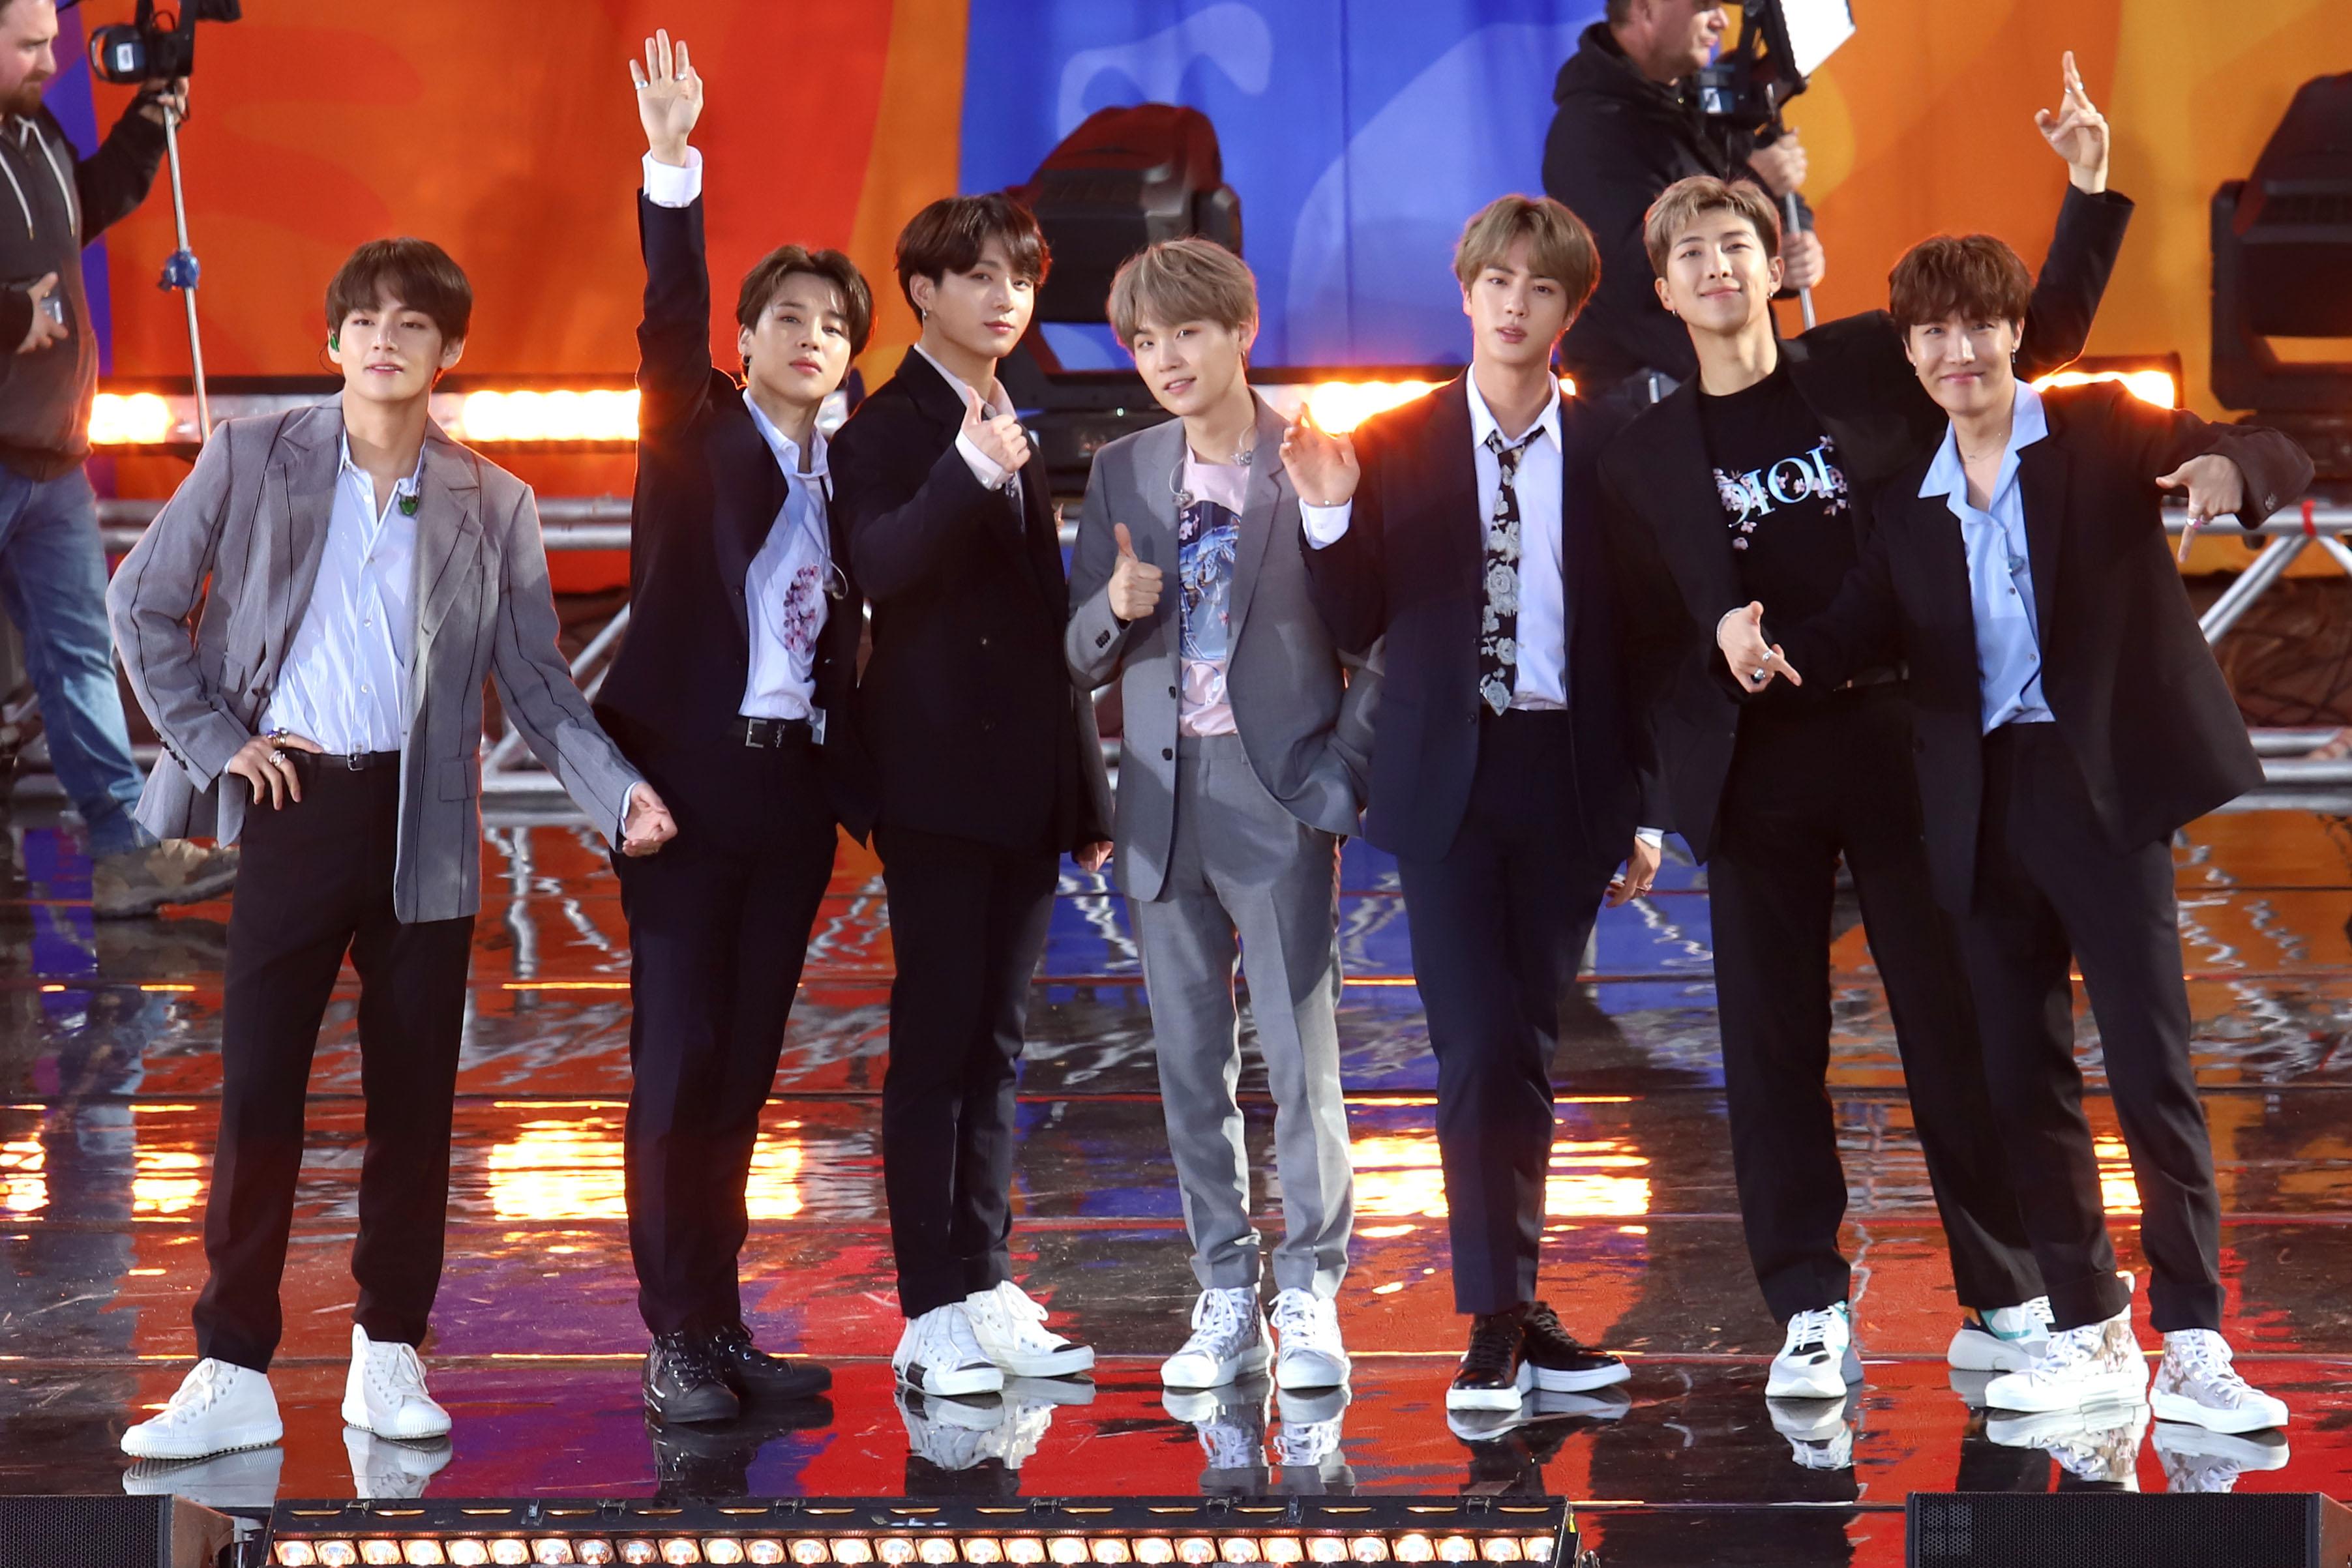 Boy band - BTS